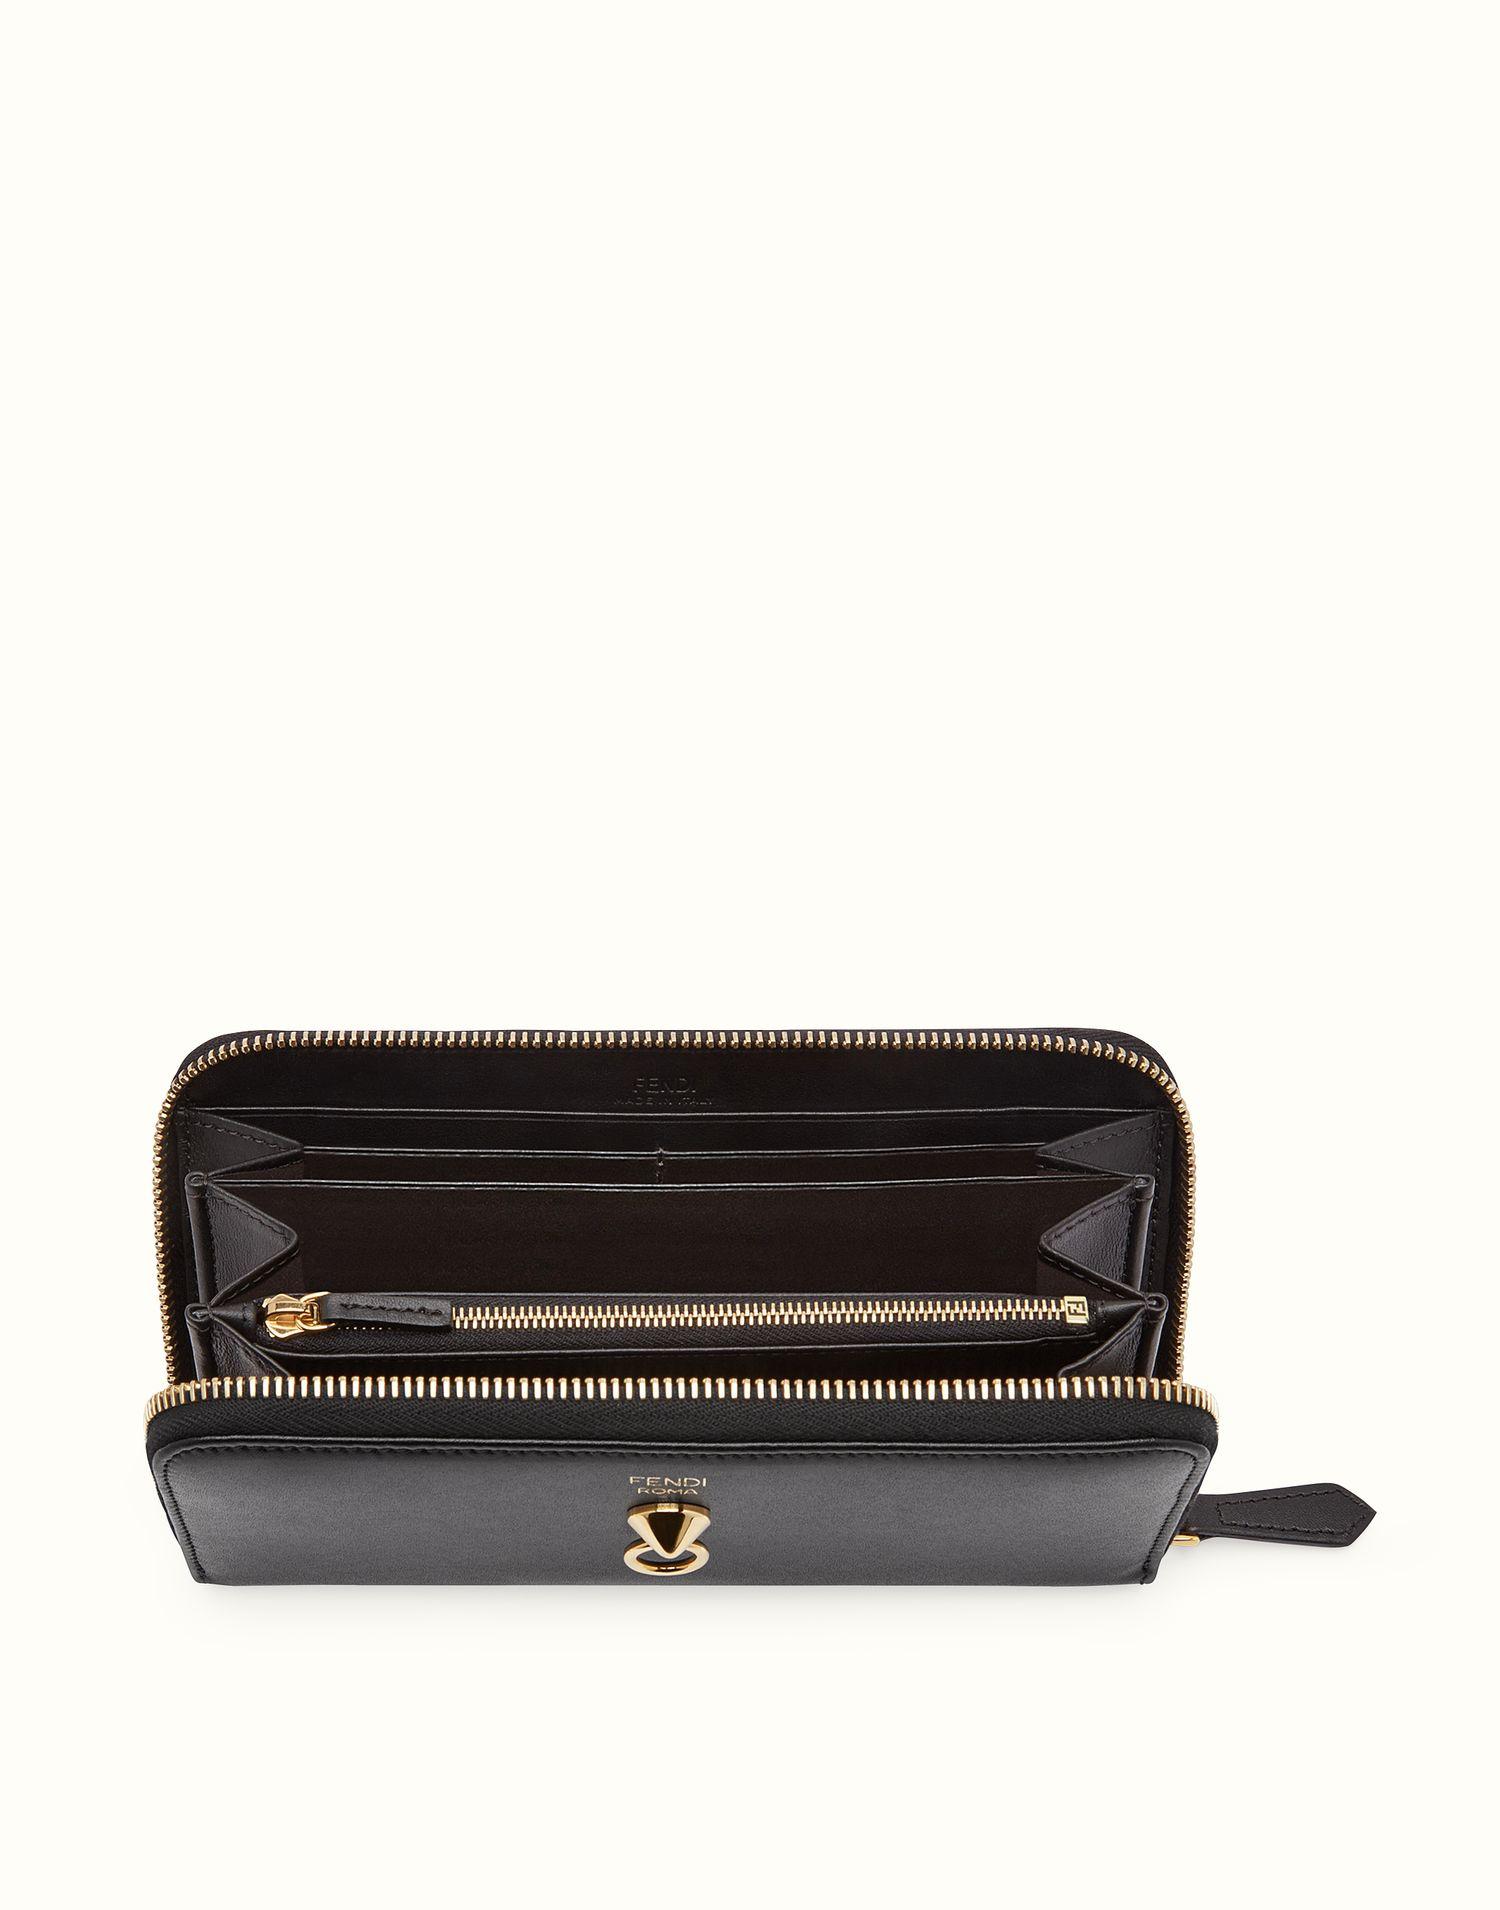 $600 FENDI WALLET - Black leather zip-around